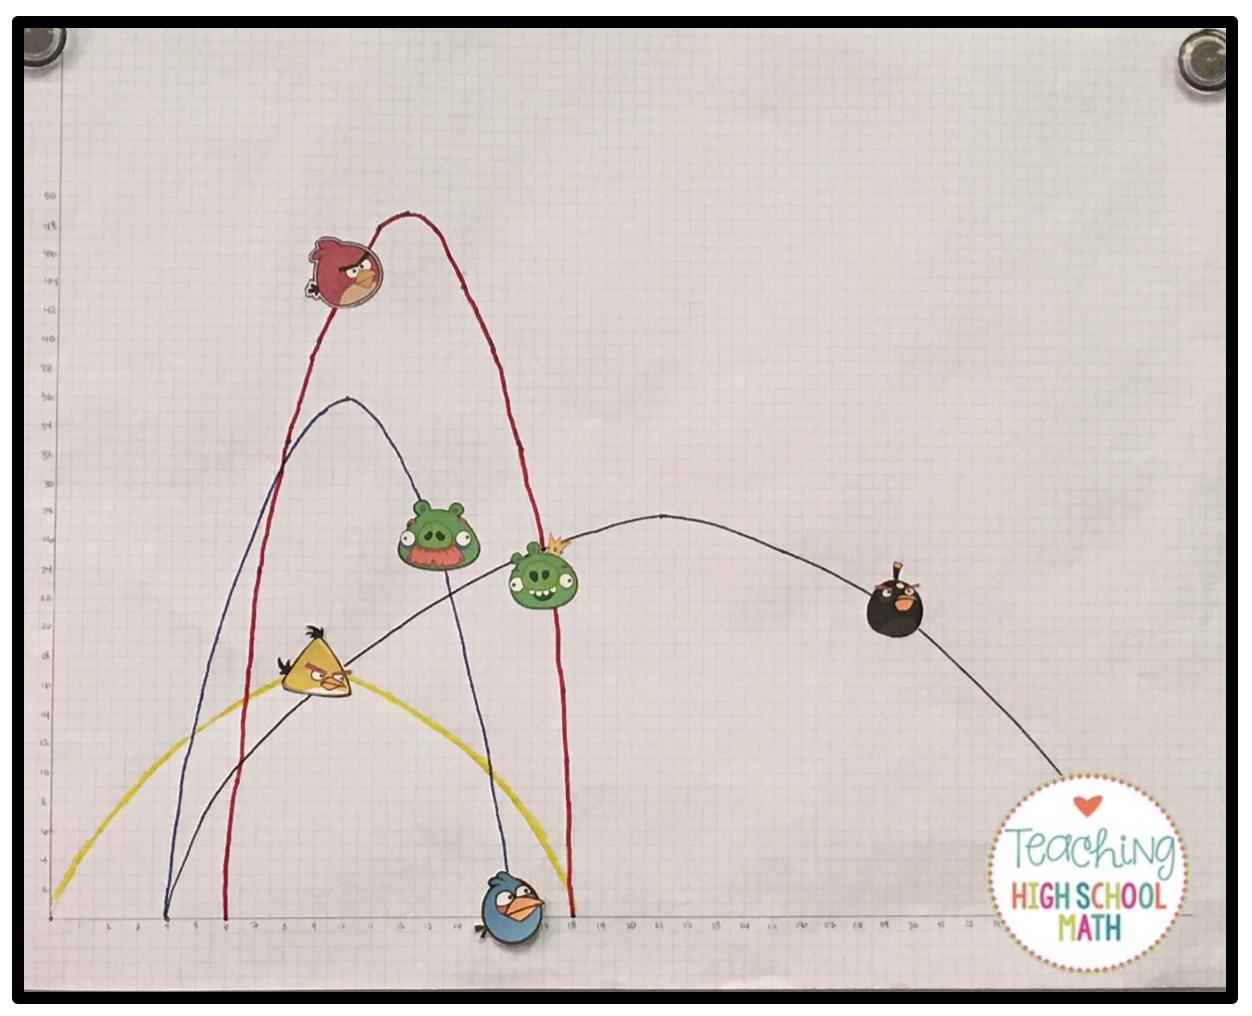 Teaching High School Math Angry Birds Parabola Project border=